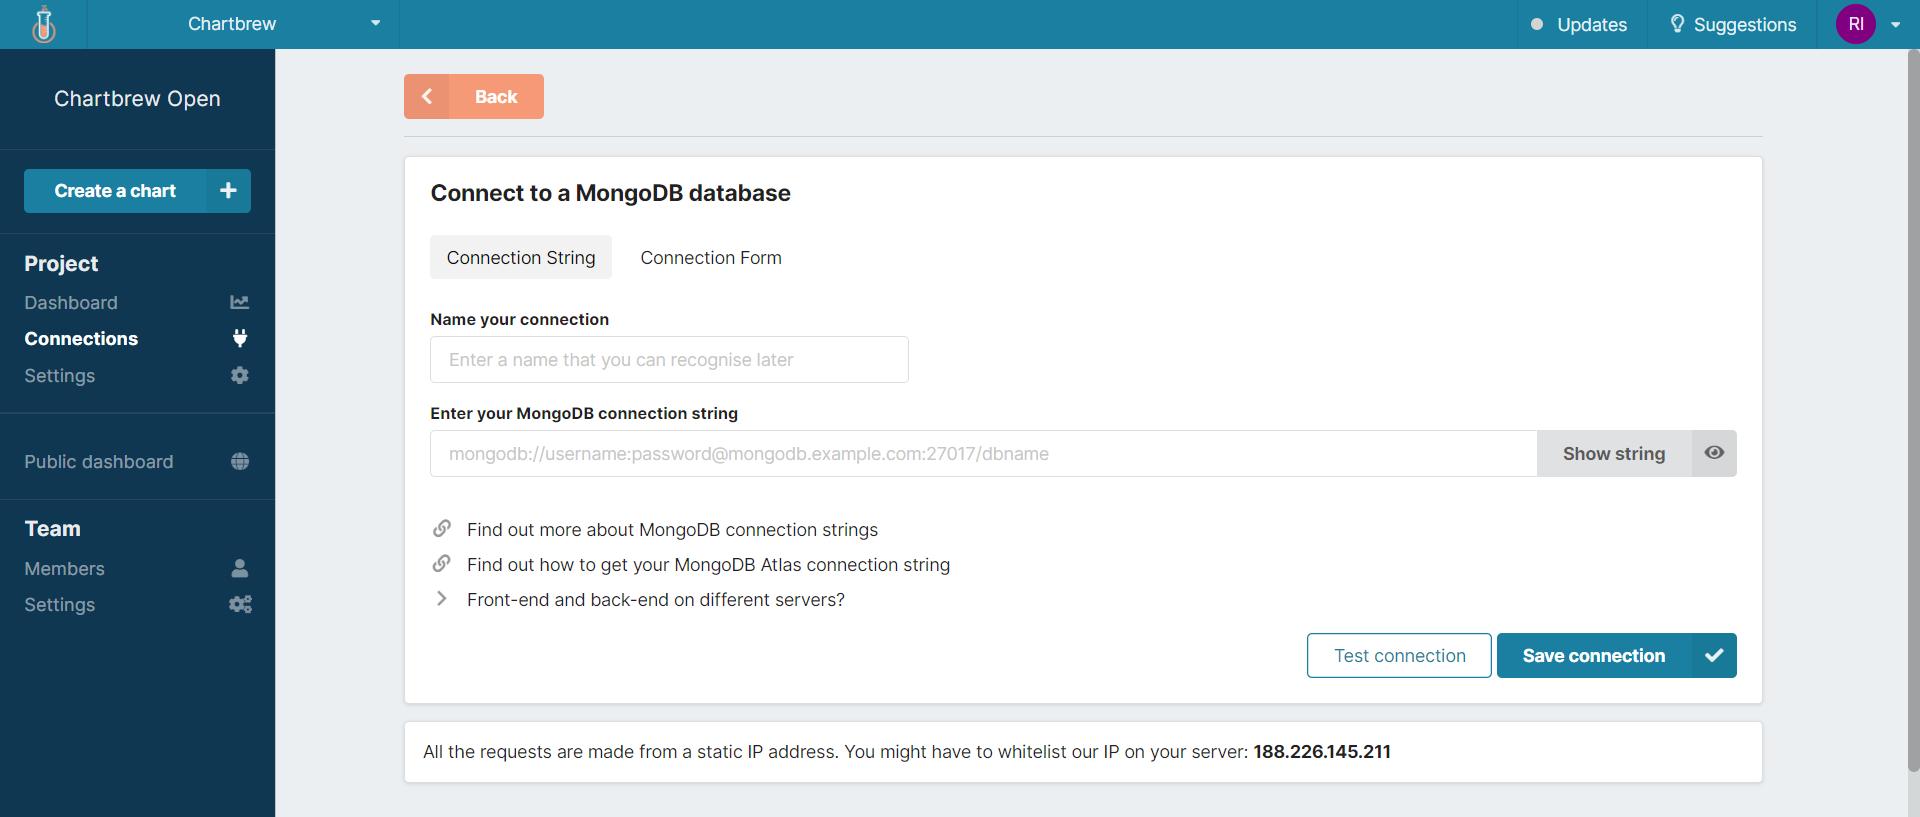 MongoDB data connection form